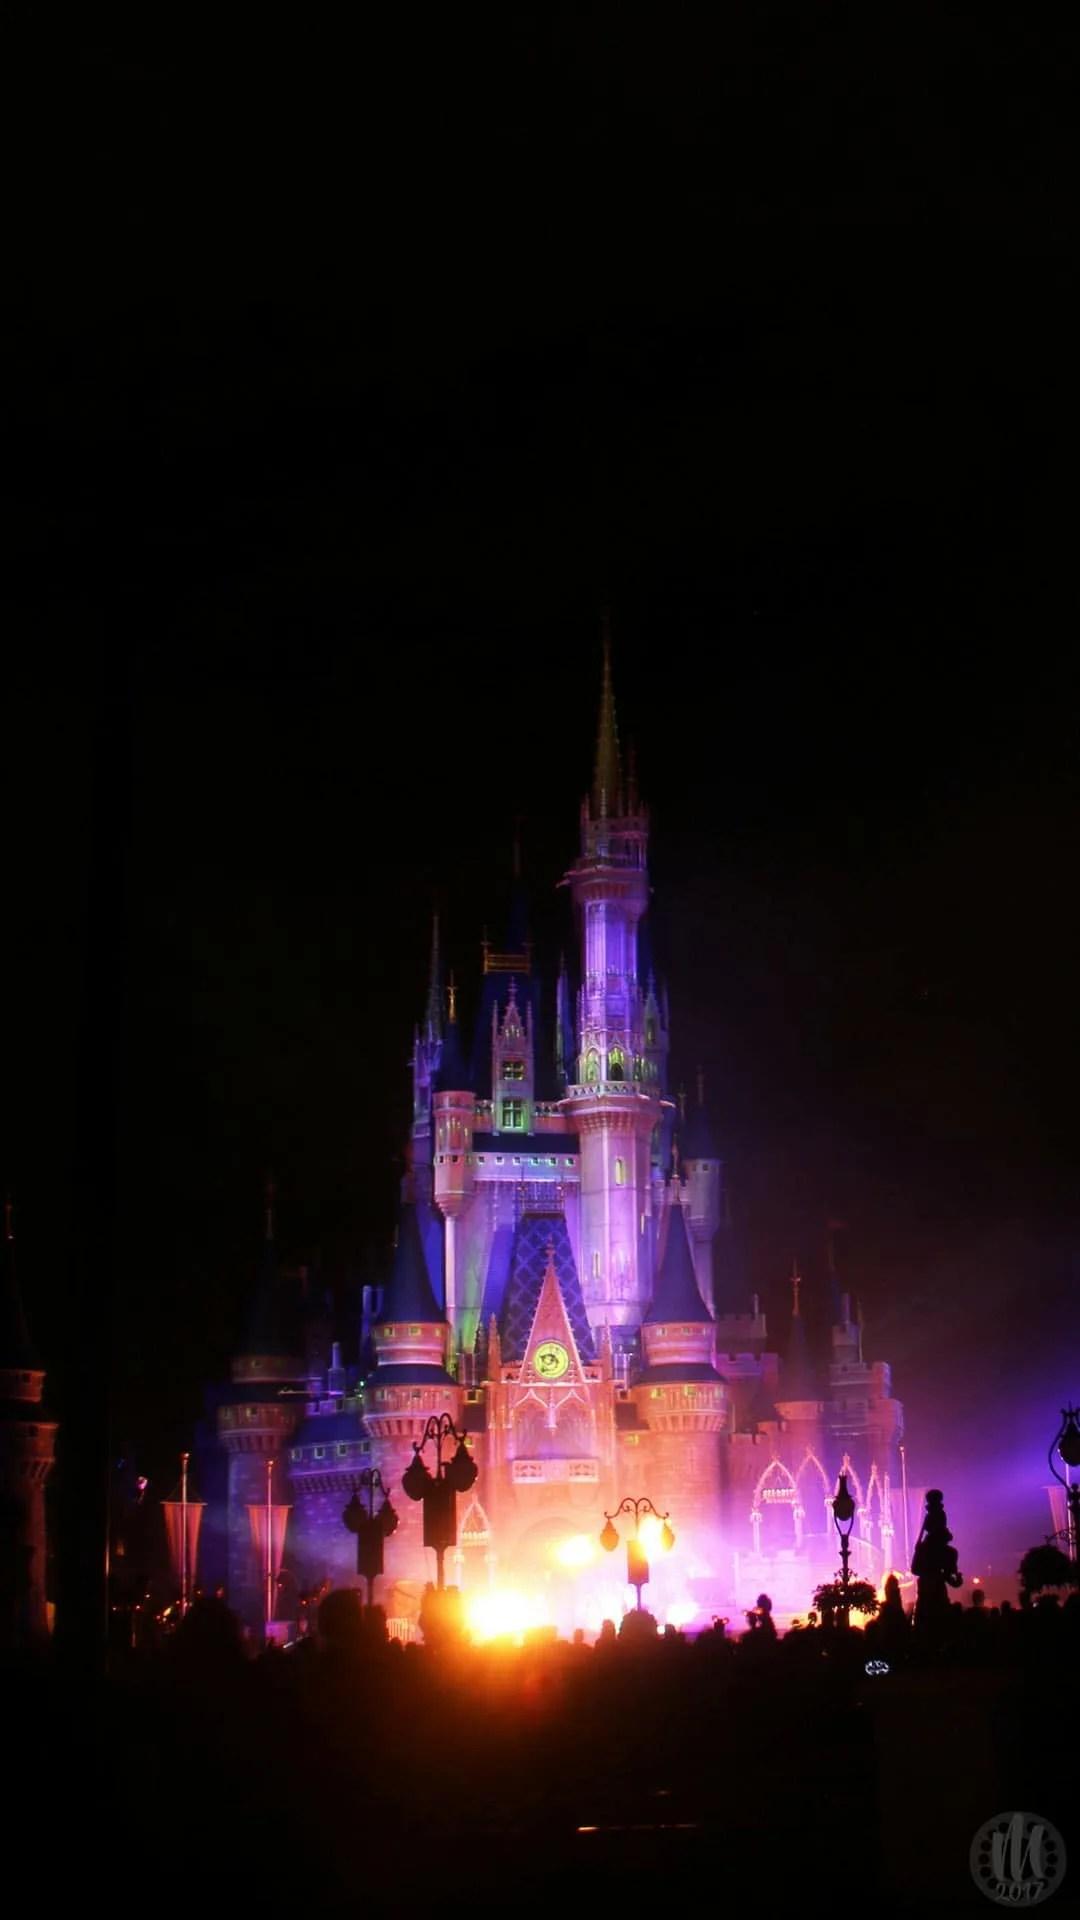 Great Wallpaper Halloween Ios - Walt-Disney-World-Halloween-iPhone-Wallpapers-9  Pictures_491117.jpg?resize\u003d1080%2C1920\u0026ssl\u003d1